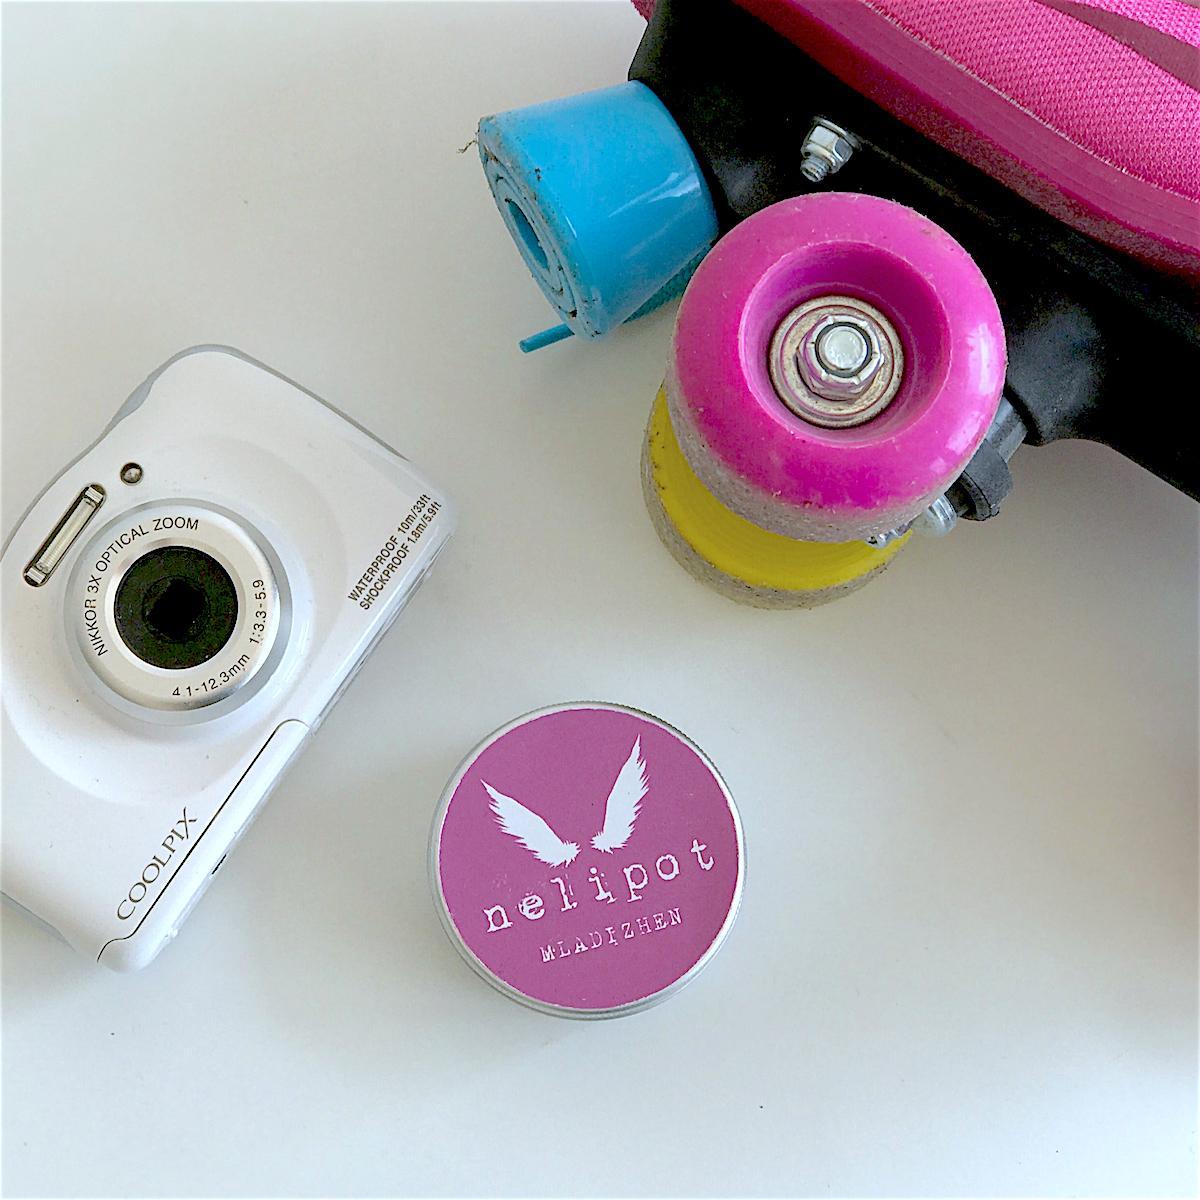 dezodoranti-brez-aluminijeve-soli-sode-bikarbone-nelipot-mladizhen